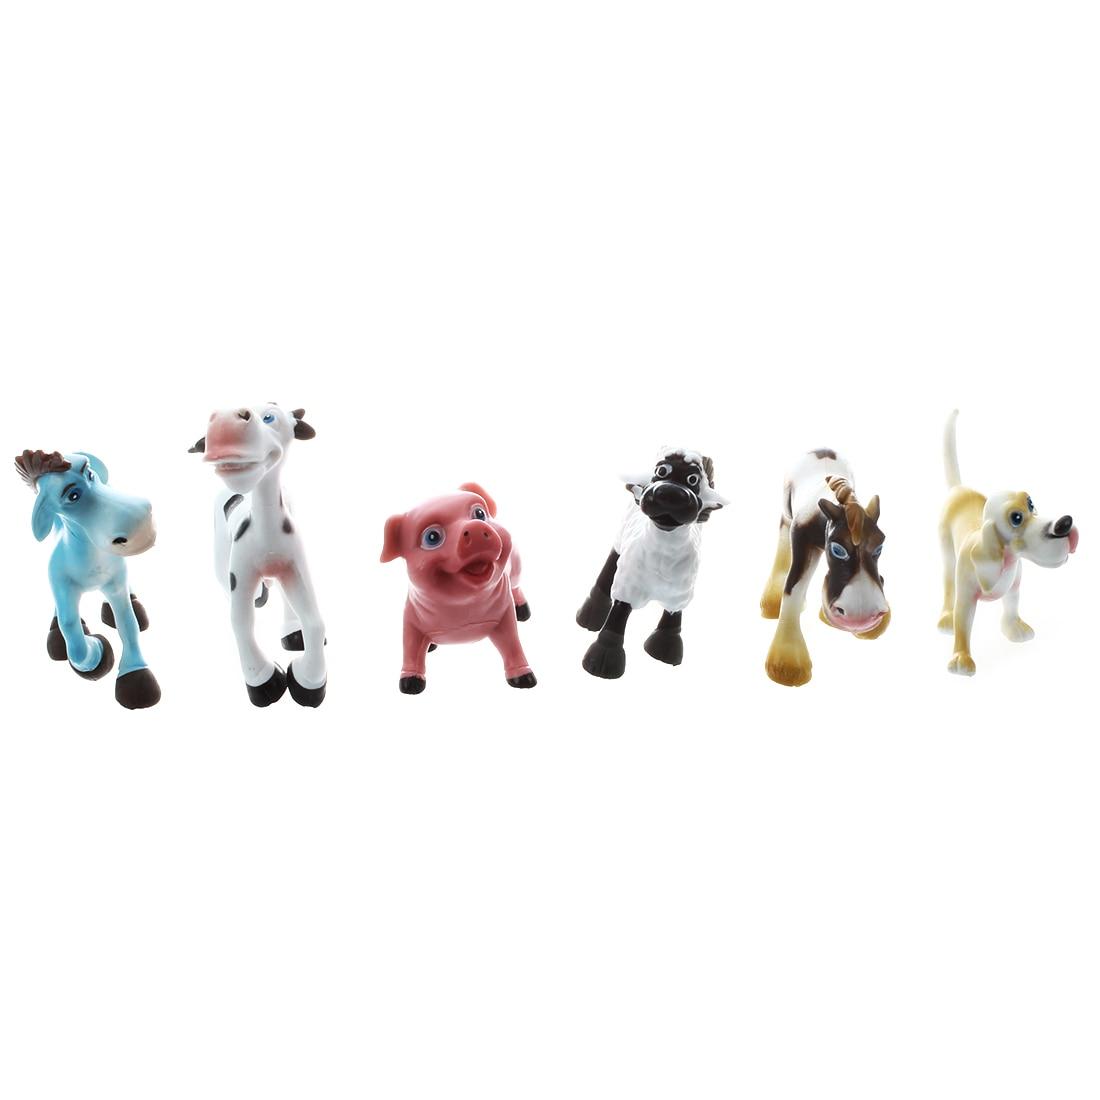 ABWE Best Sale 6 New Hard Plastic Cartoon Farm Animals Figures Set Toy Kid Children abwe best sale high efficiency 540 17 5t